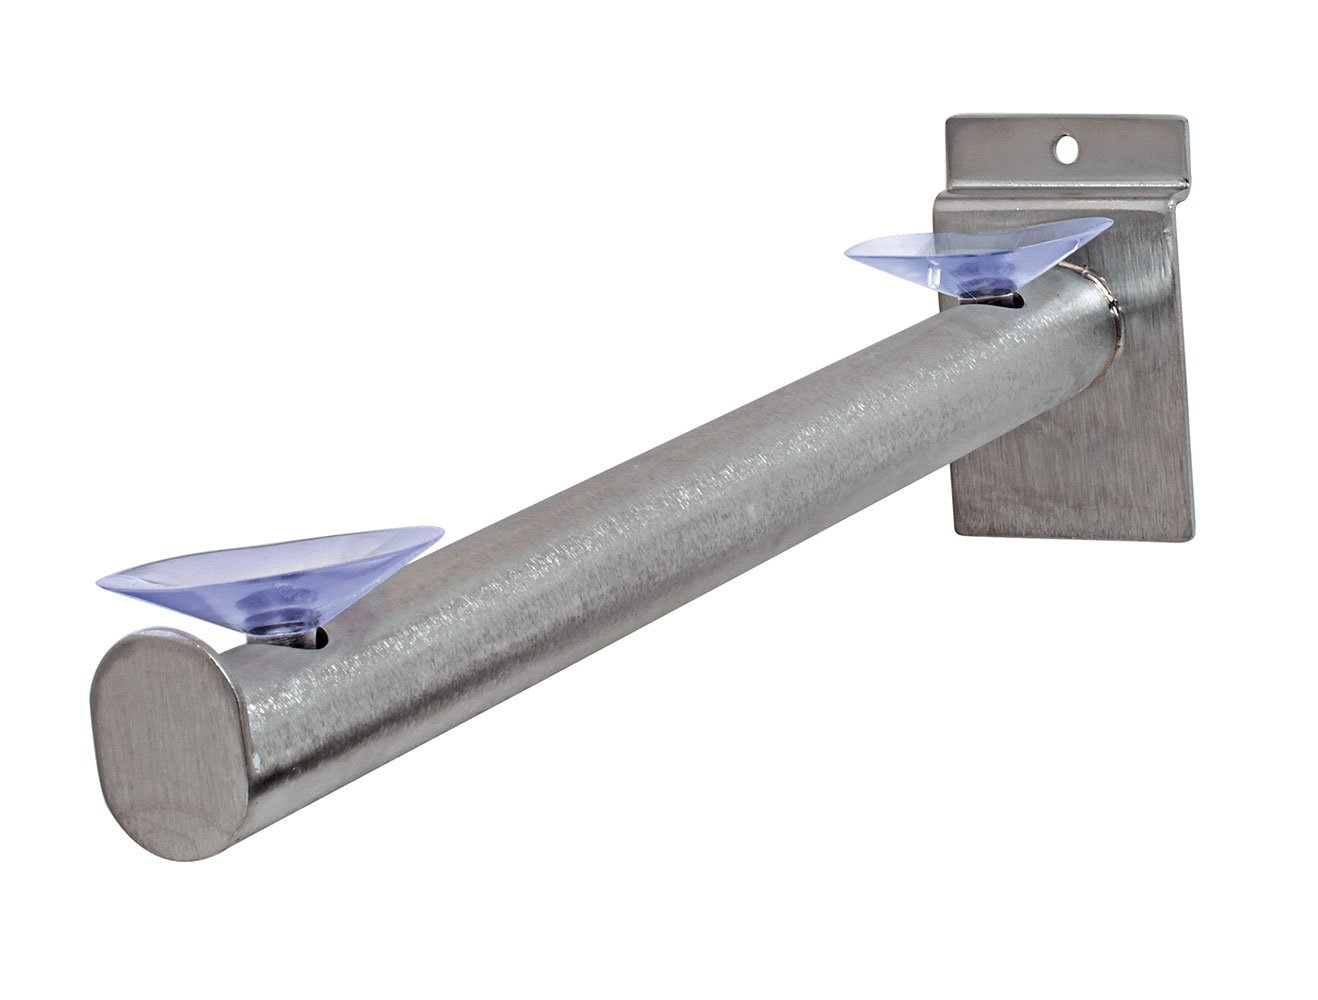 Details about  /Shelf Bracket for Slatwall 12 inch Pack Of 15